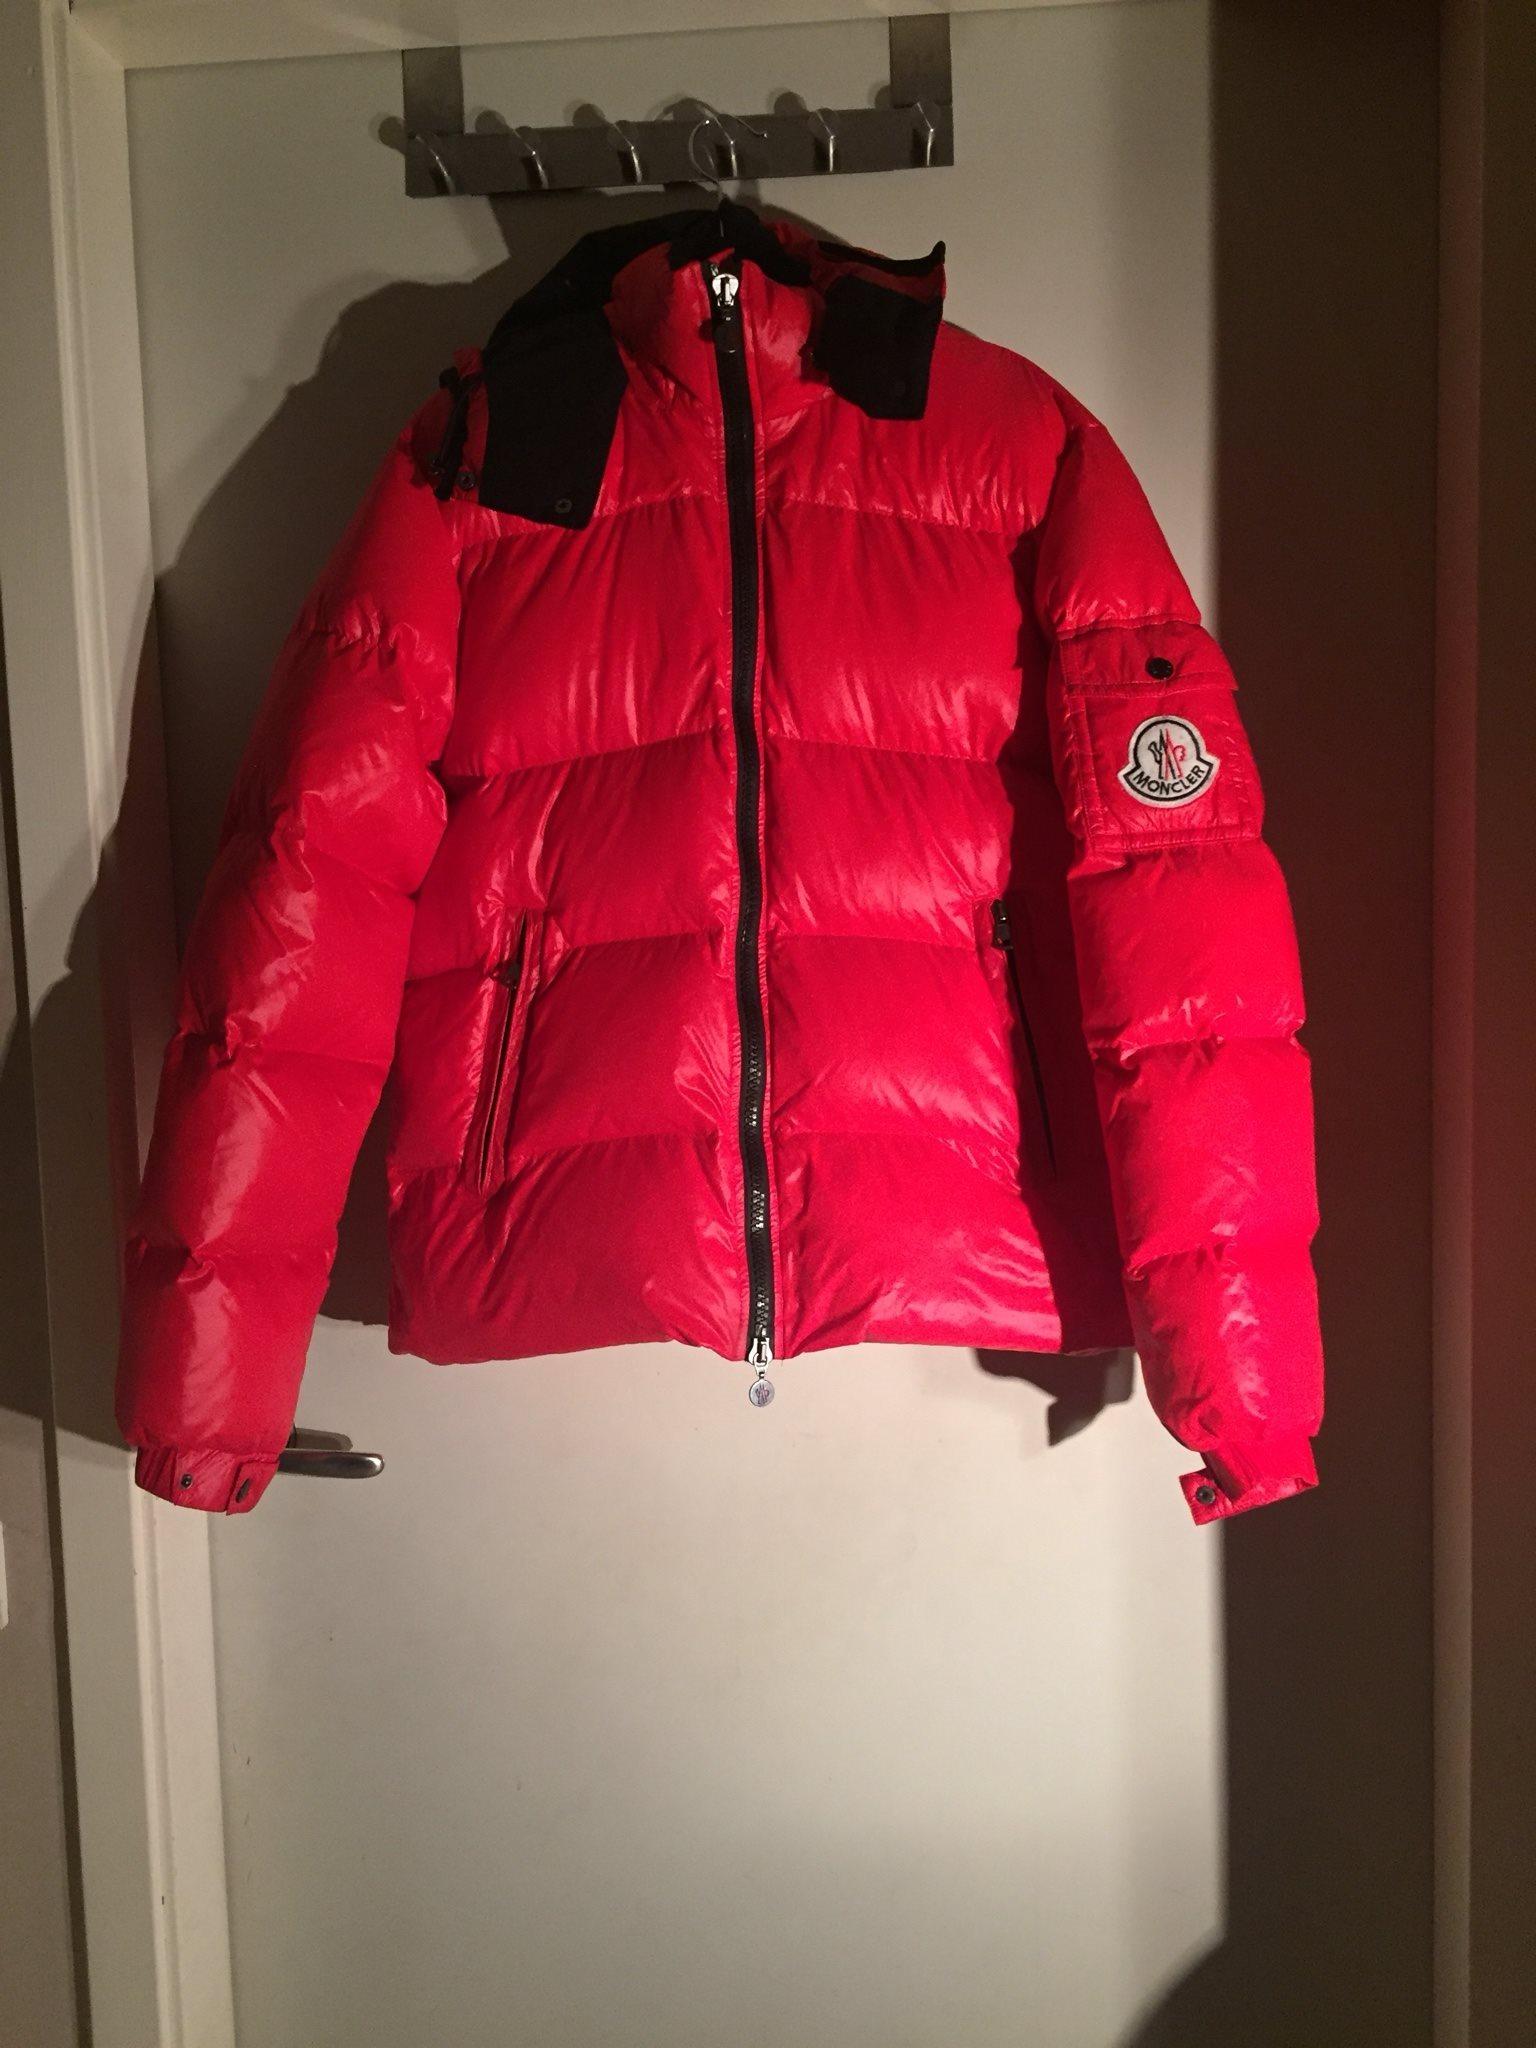 Röd Himalaya Monclear dunjacka strl 6 (338552328) ᐈ Köp på Tradera 3932bdbfeb7c4